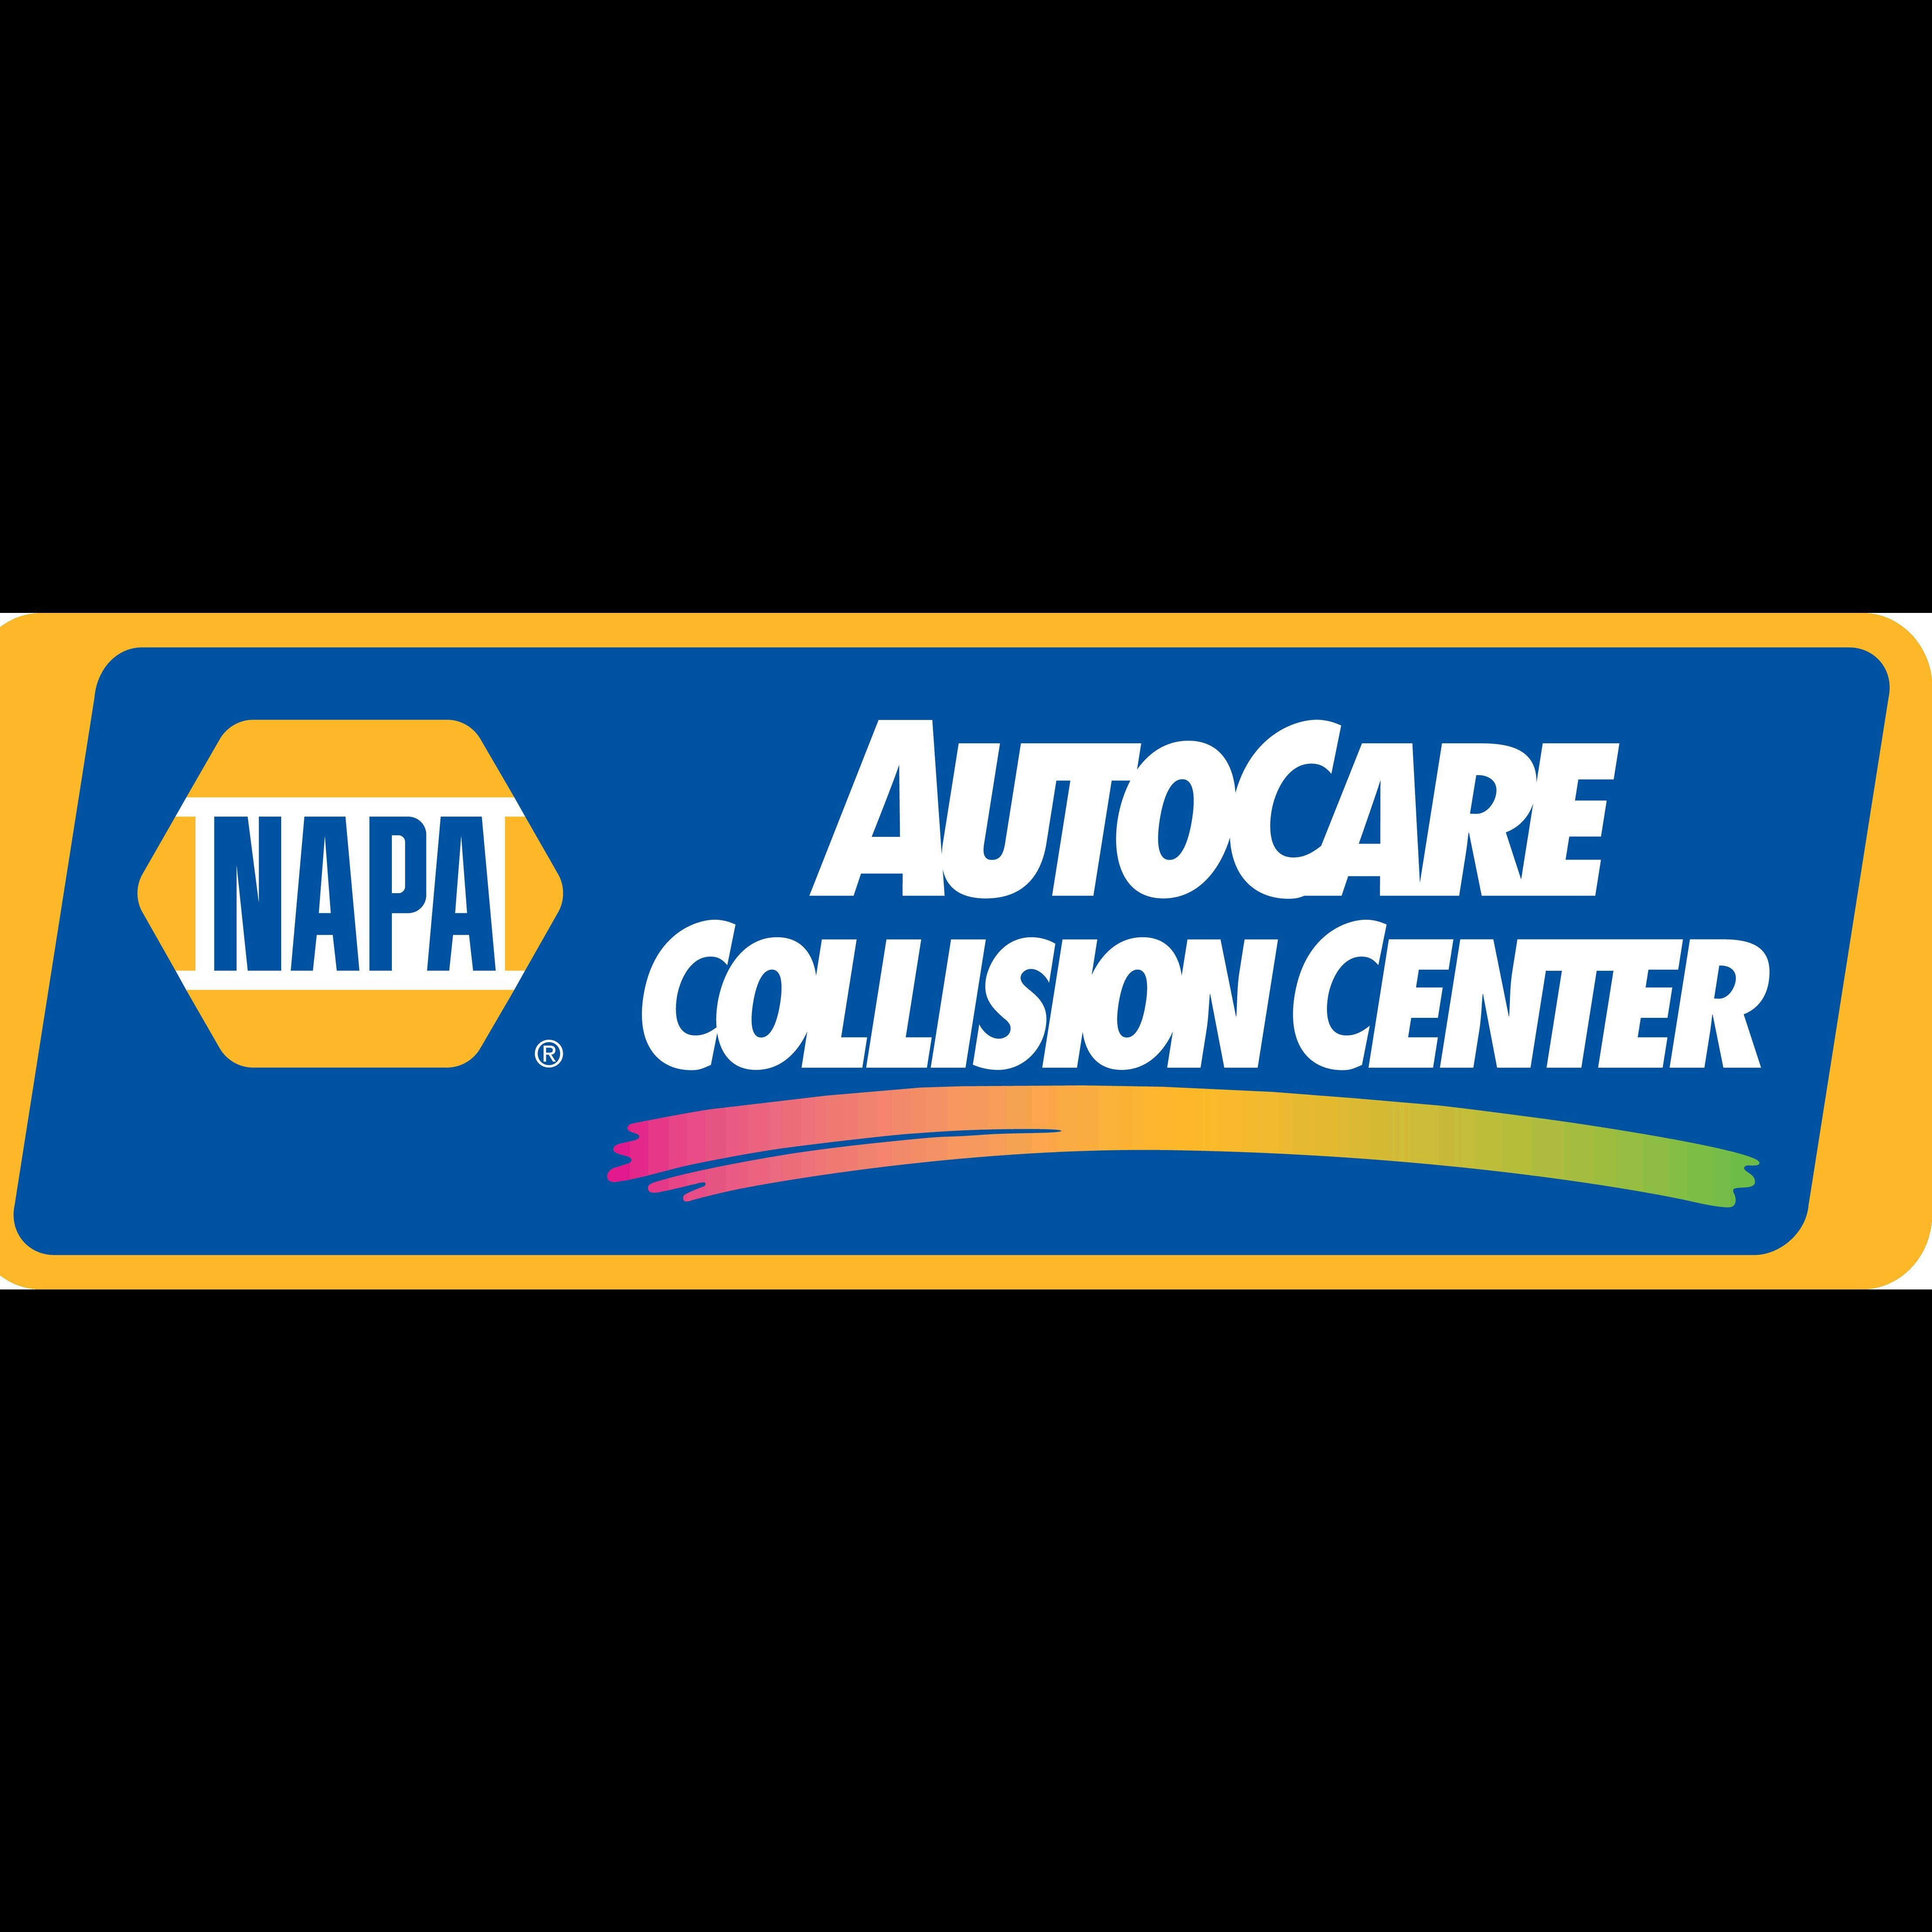 Meineke Car Care Center Companies News Videos Images